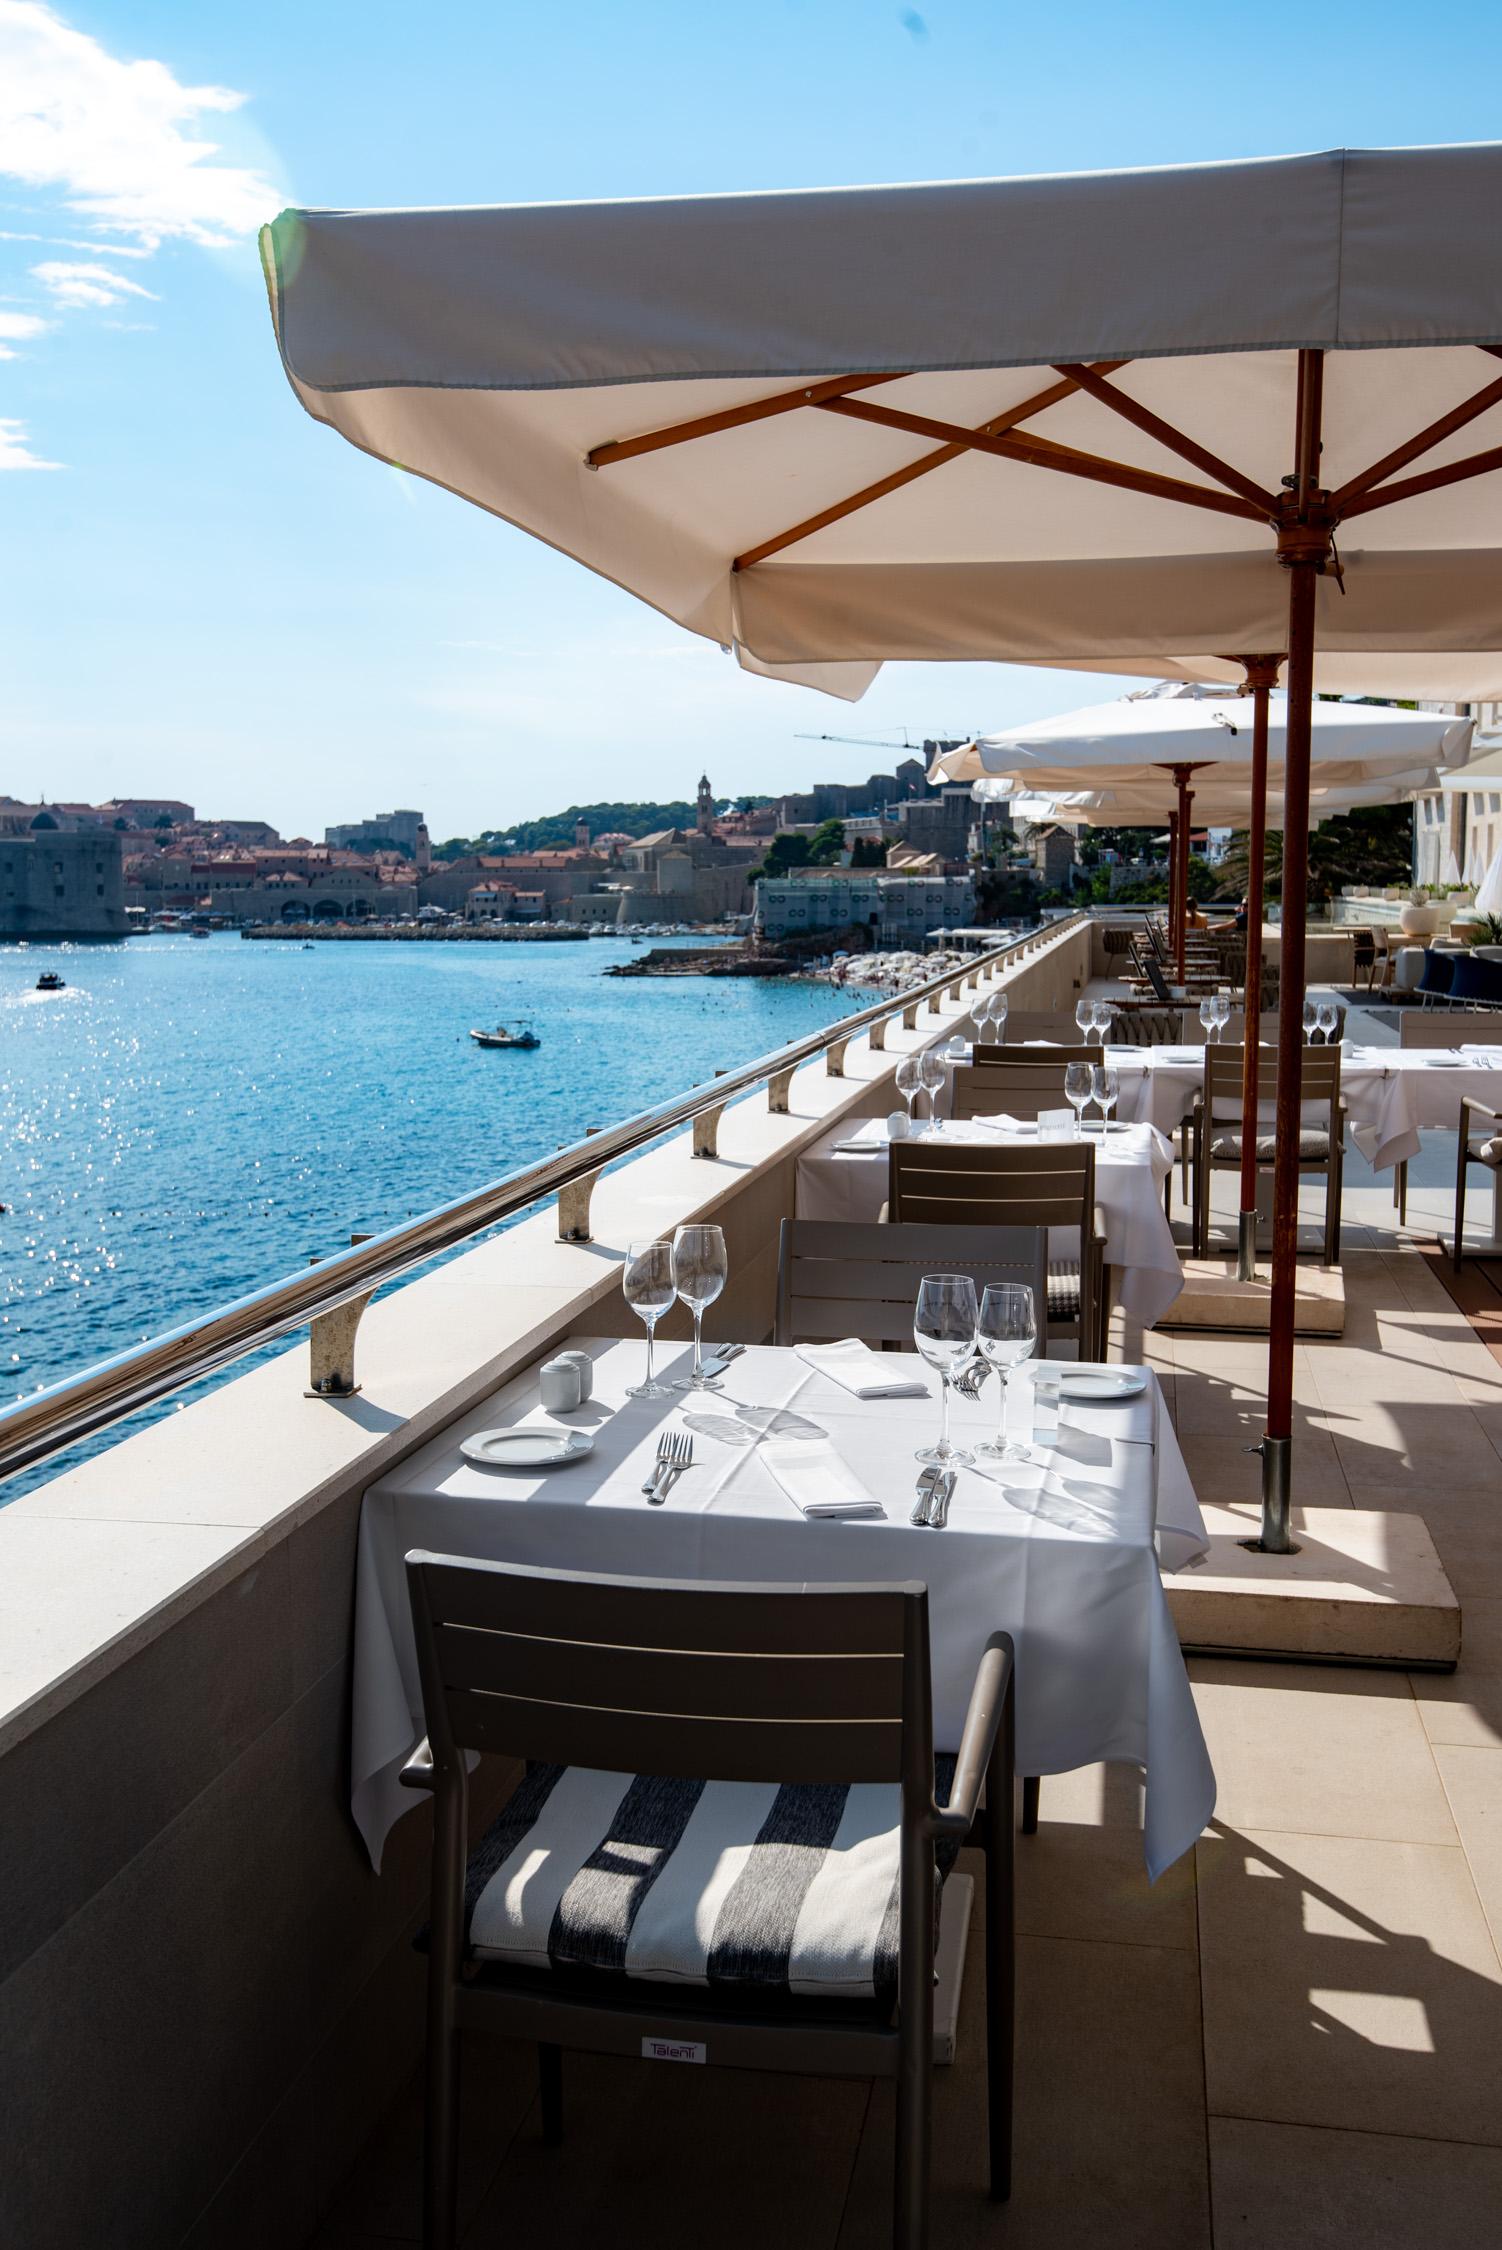 Dubrovnik-79-20180820.jpg